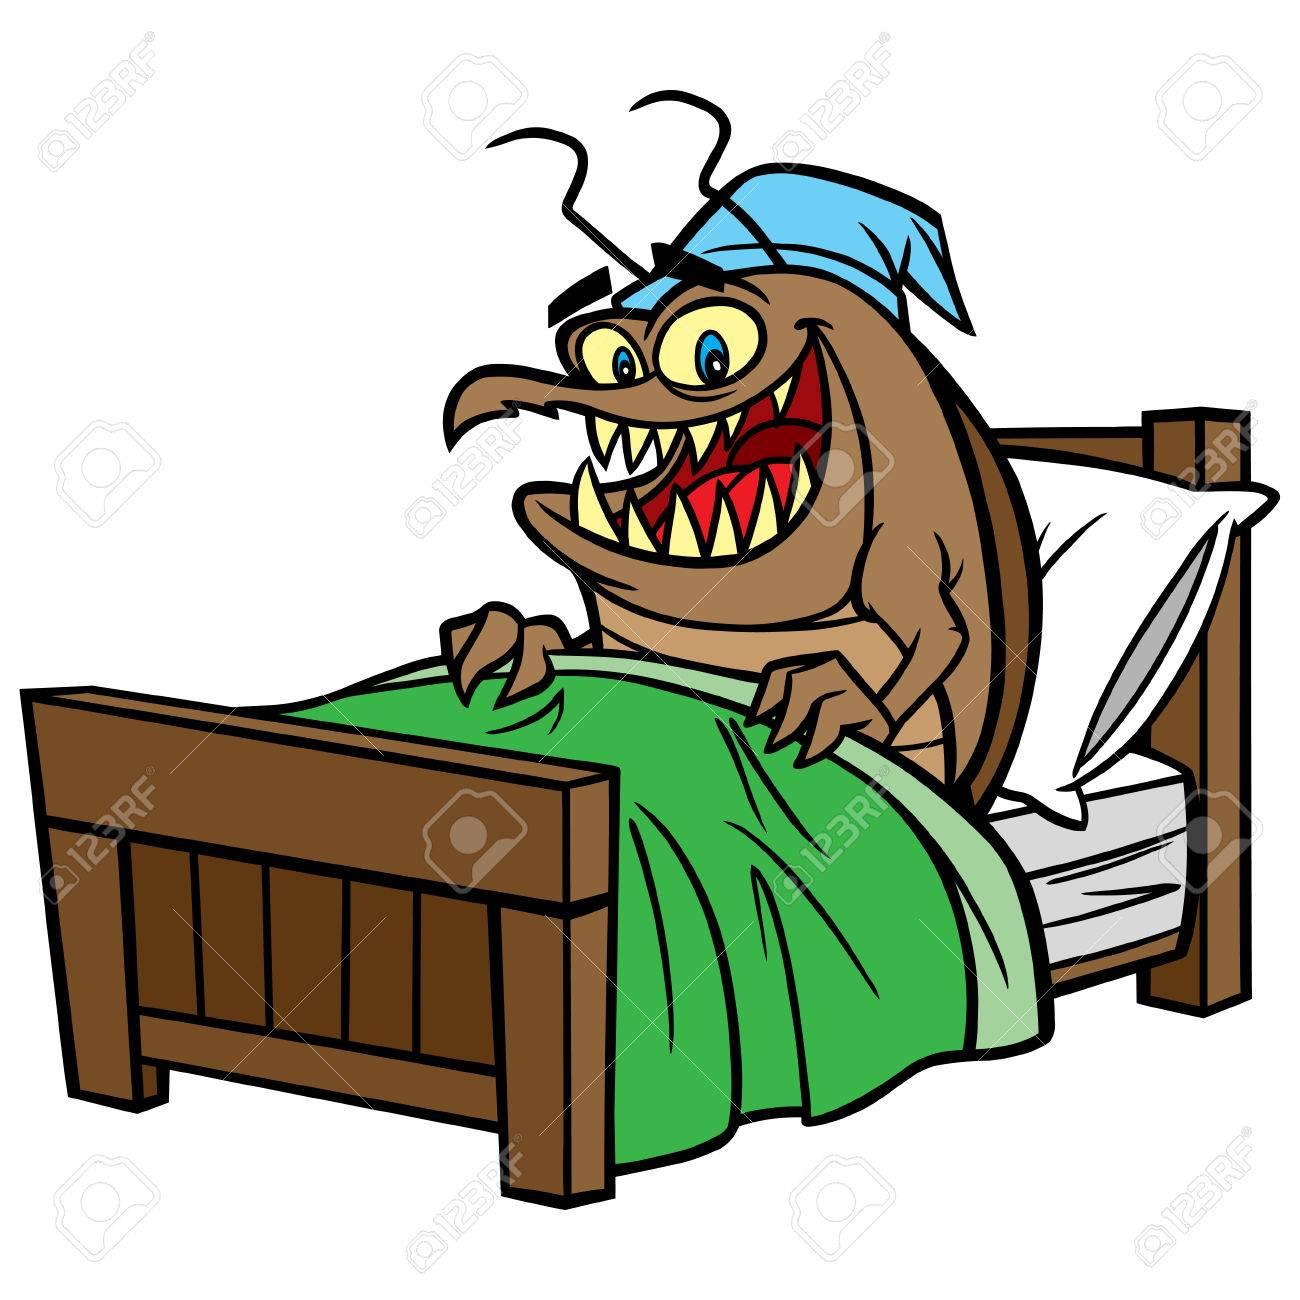 [Image: 57278621-bed-bug-in-bed.jpg]